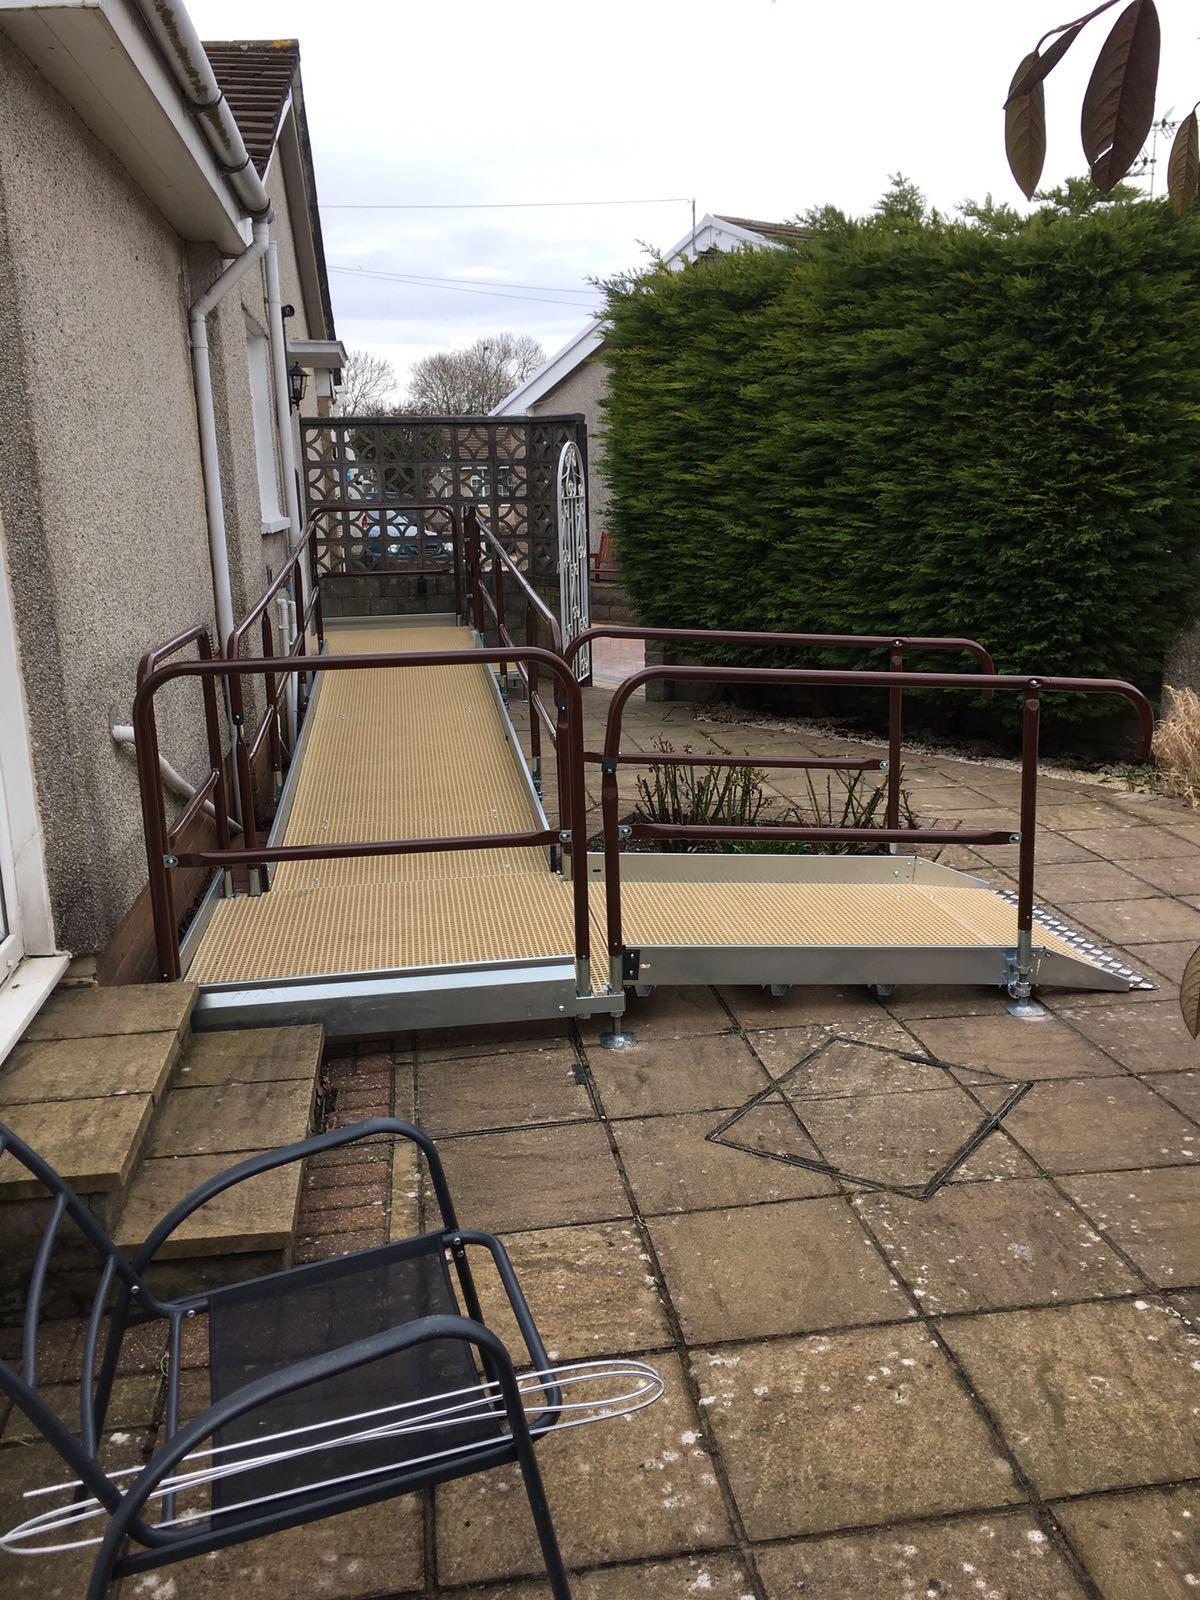 Disable ramp along building